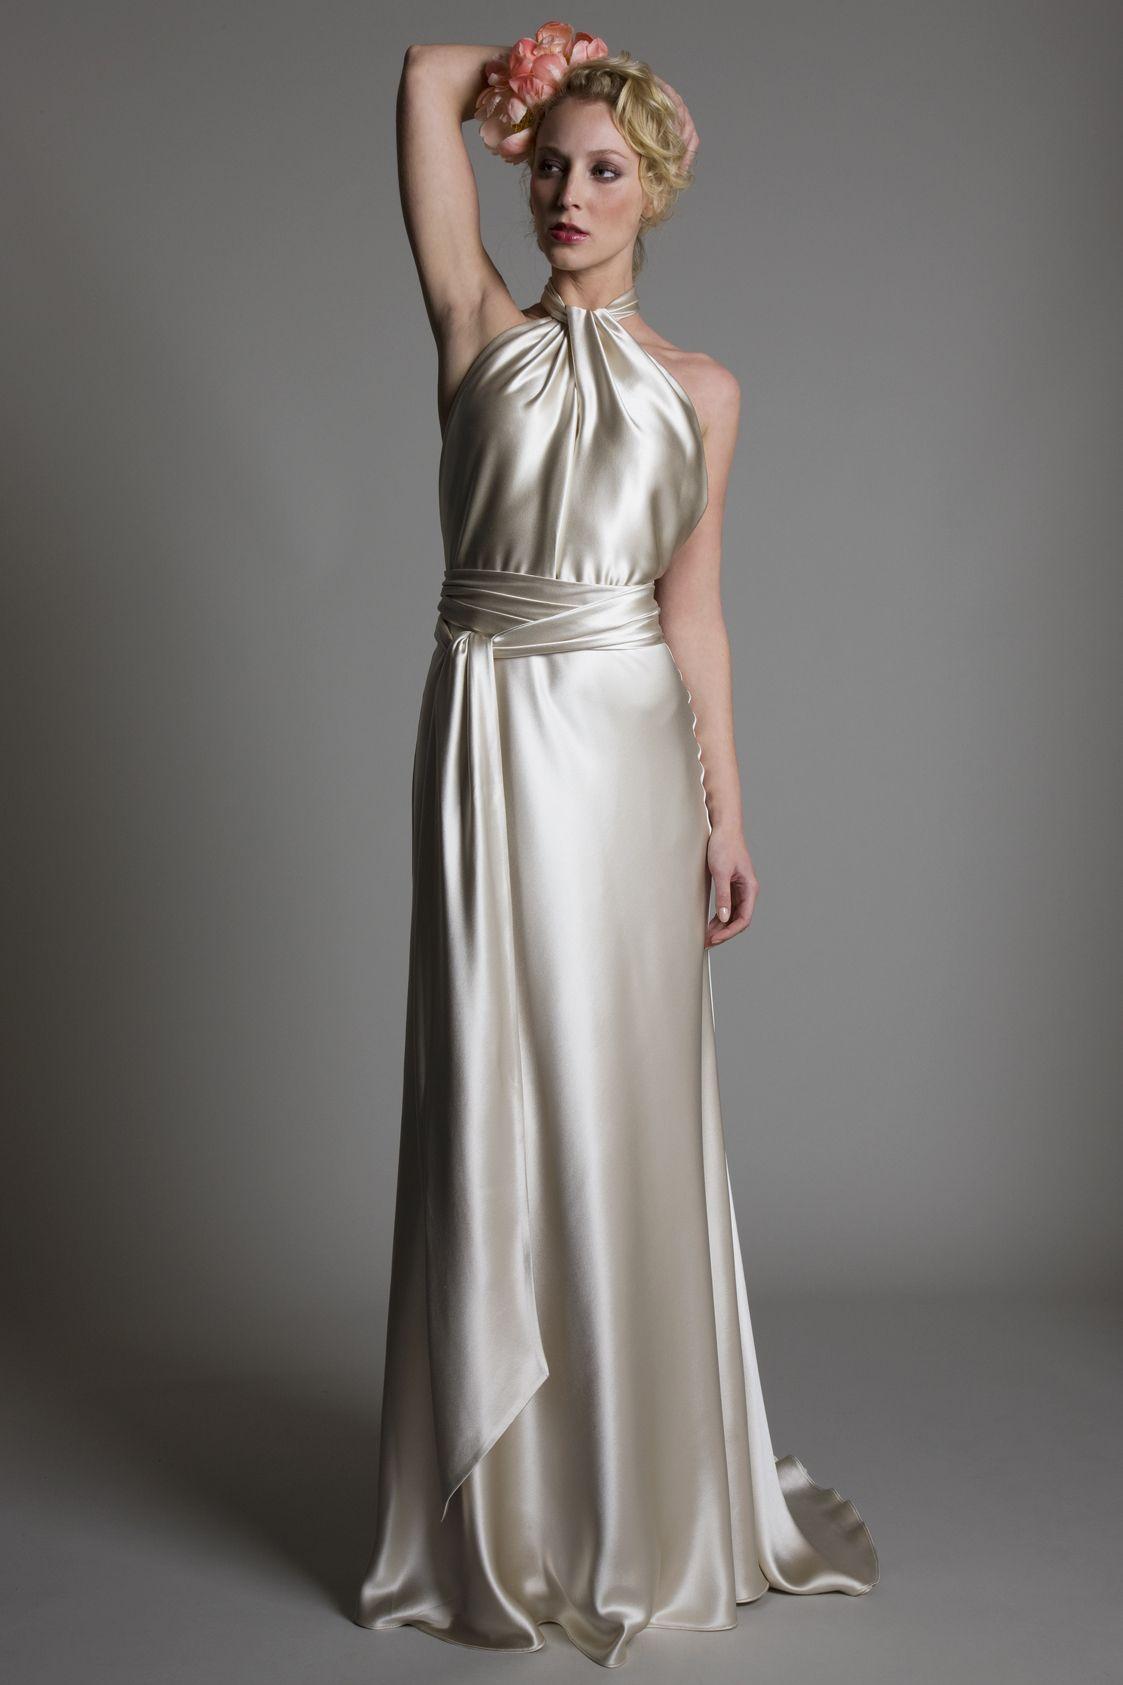 Preloved pronovias wedding dresses  Claudia satin halter neck bridal wedding dress with satin belt